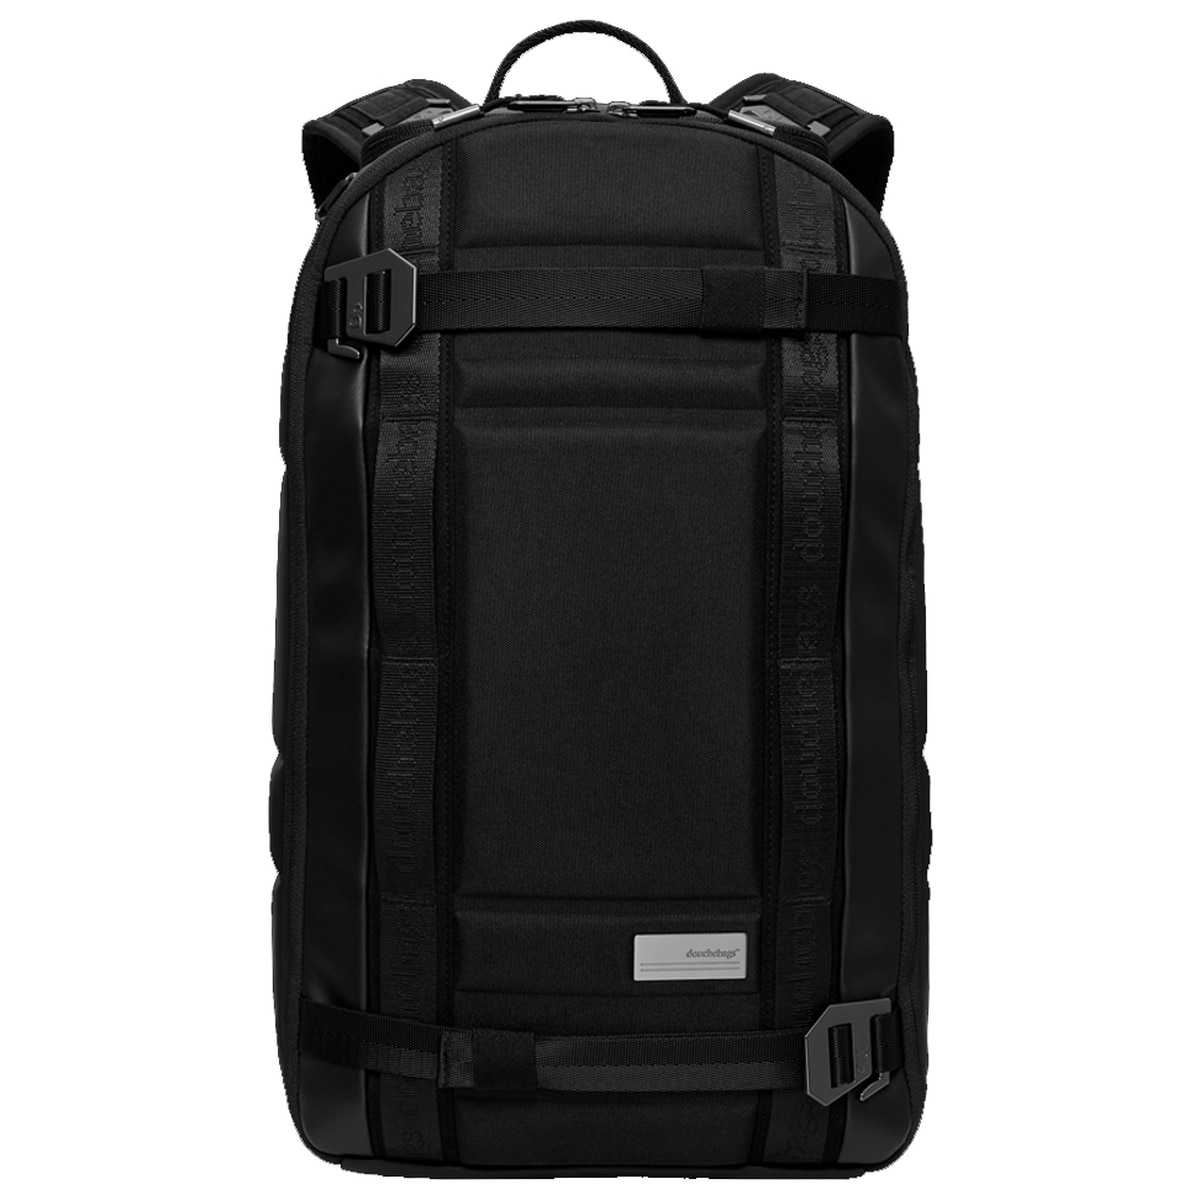 Db - The Backpack Black